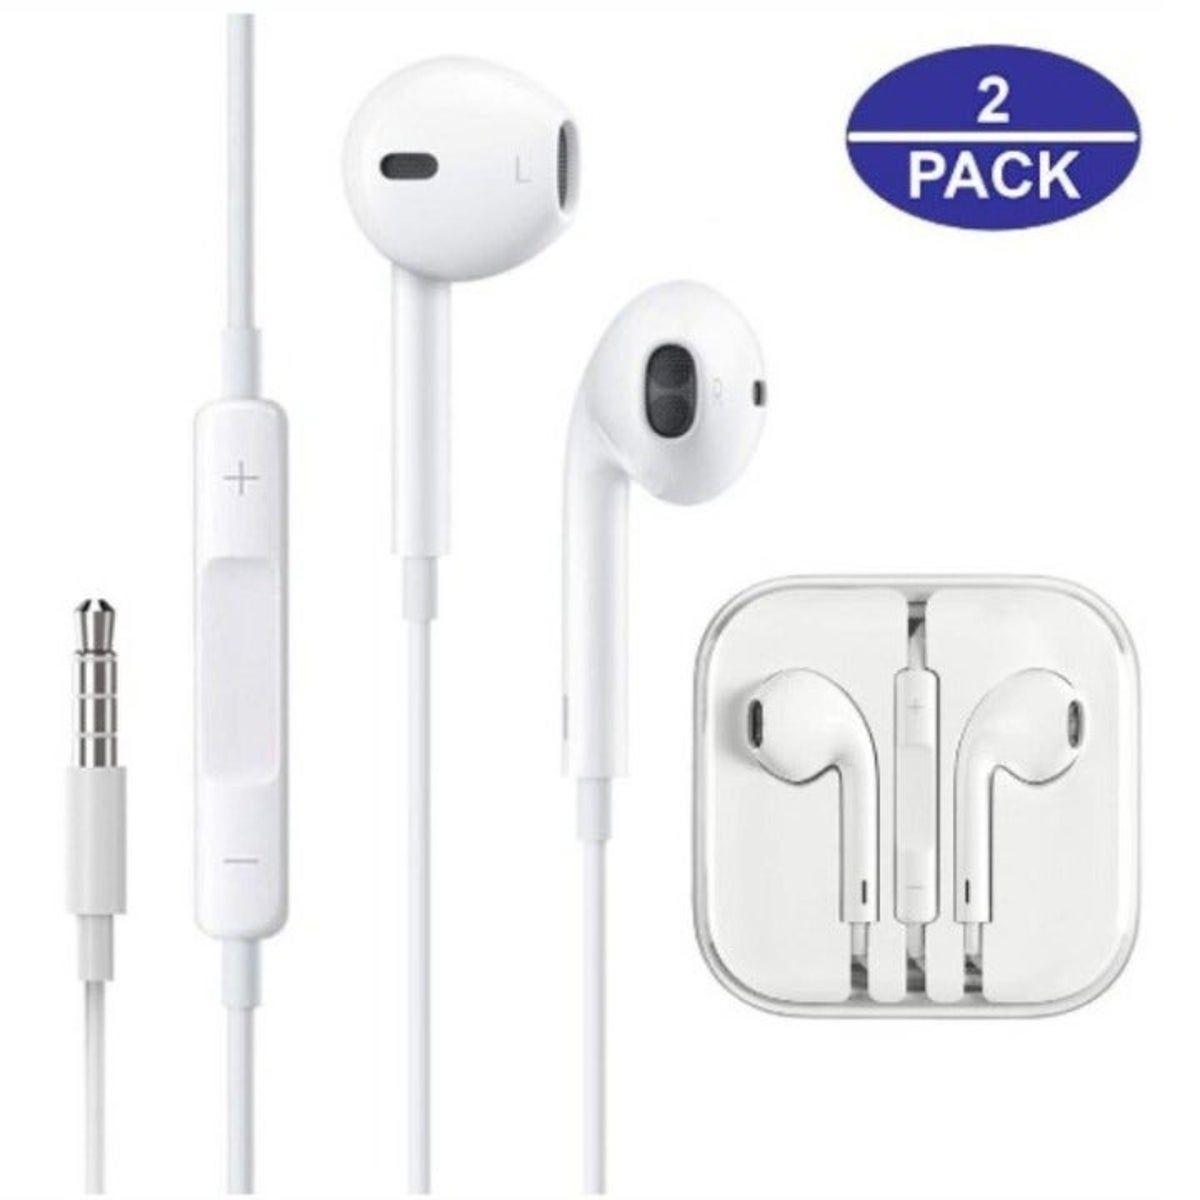 2 Pack Earbuds Premium In Ear Wired Earbuds Wired Headphones Earphone